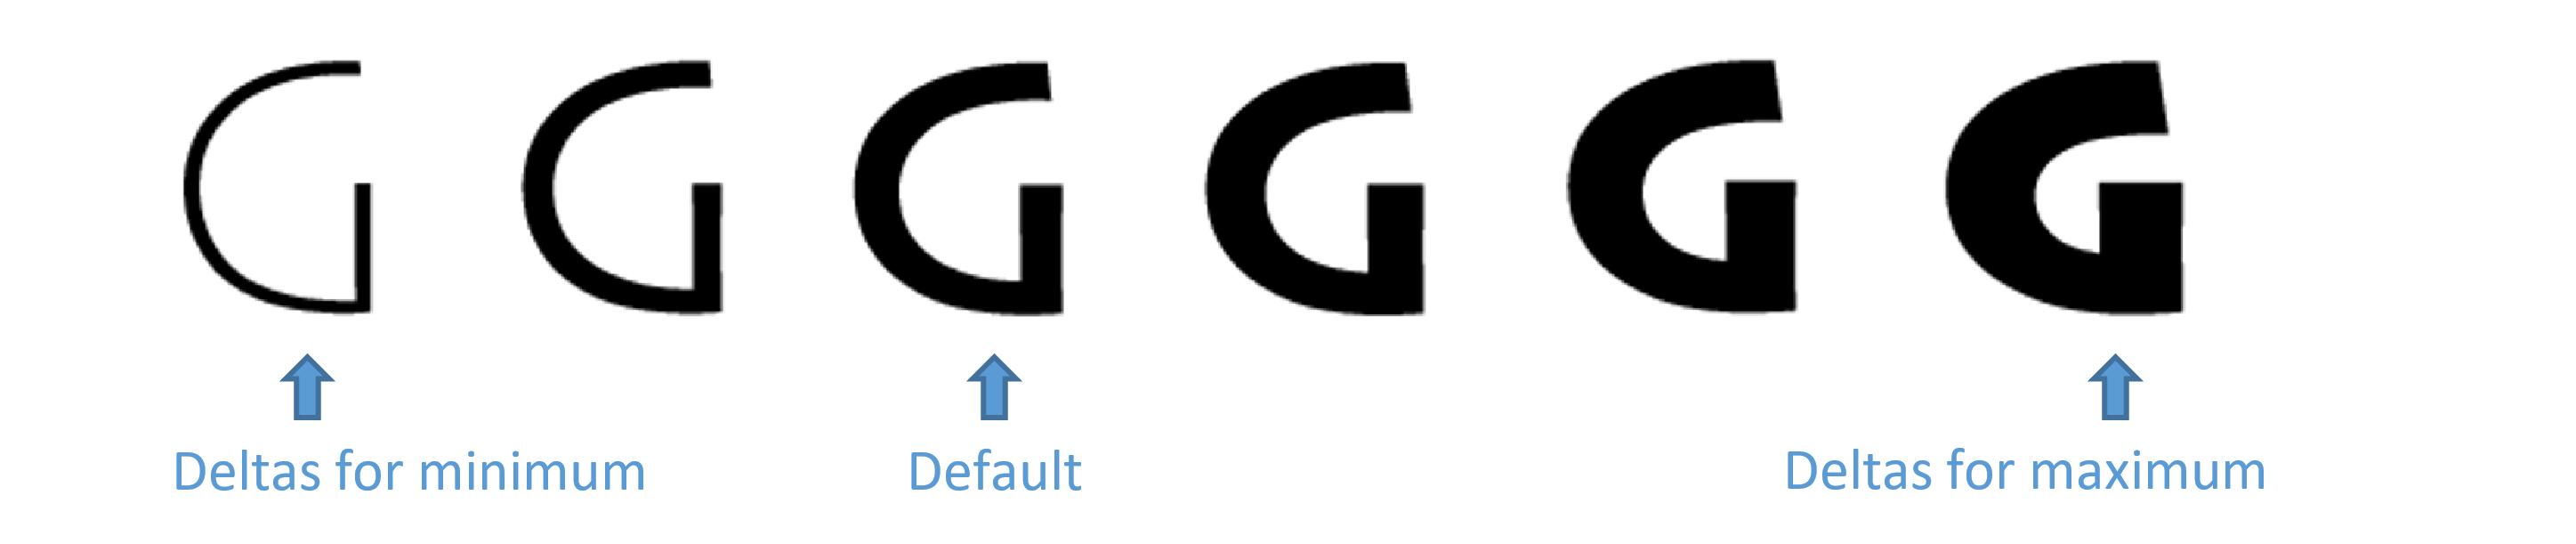 OpenType Font Variations overview - Typography | Microsoft Docs